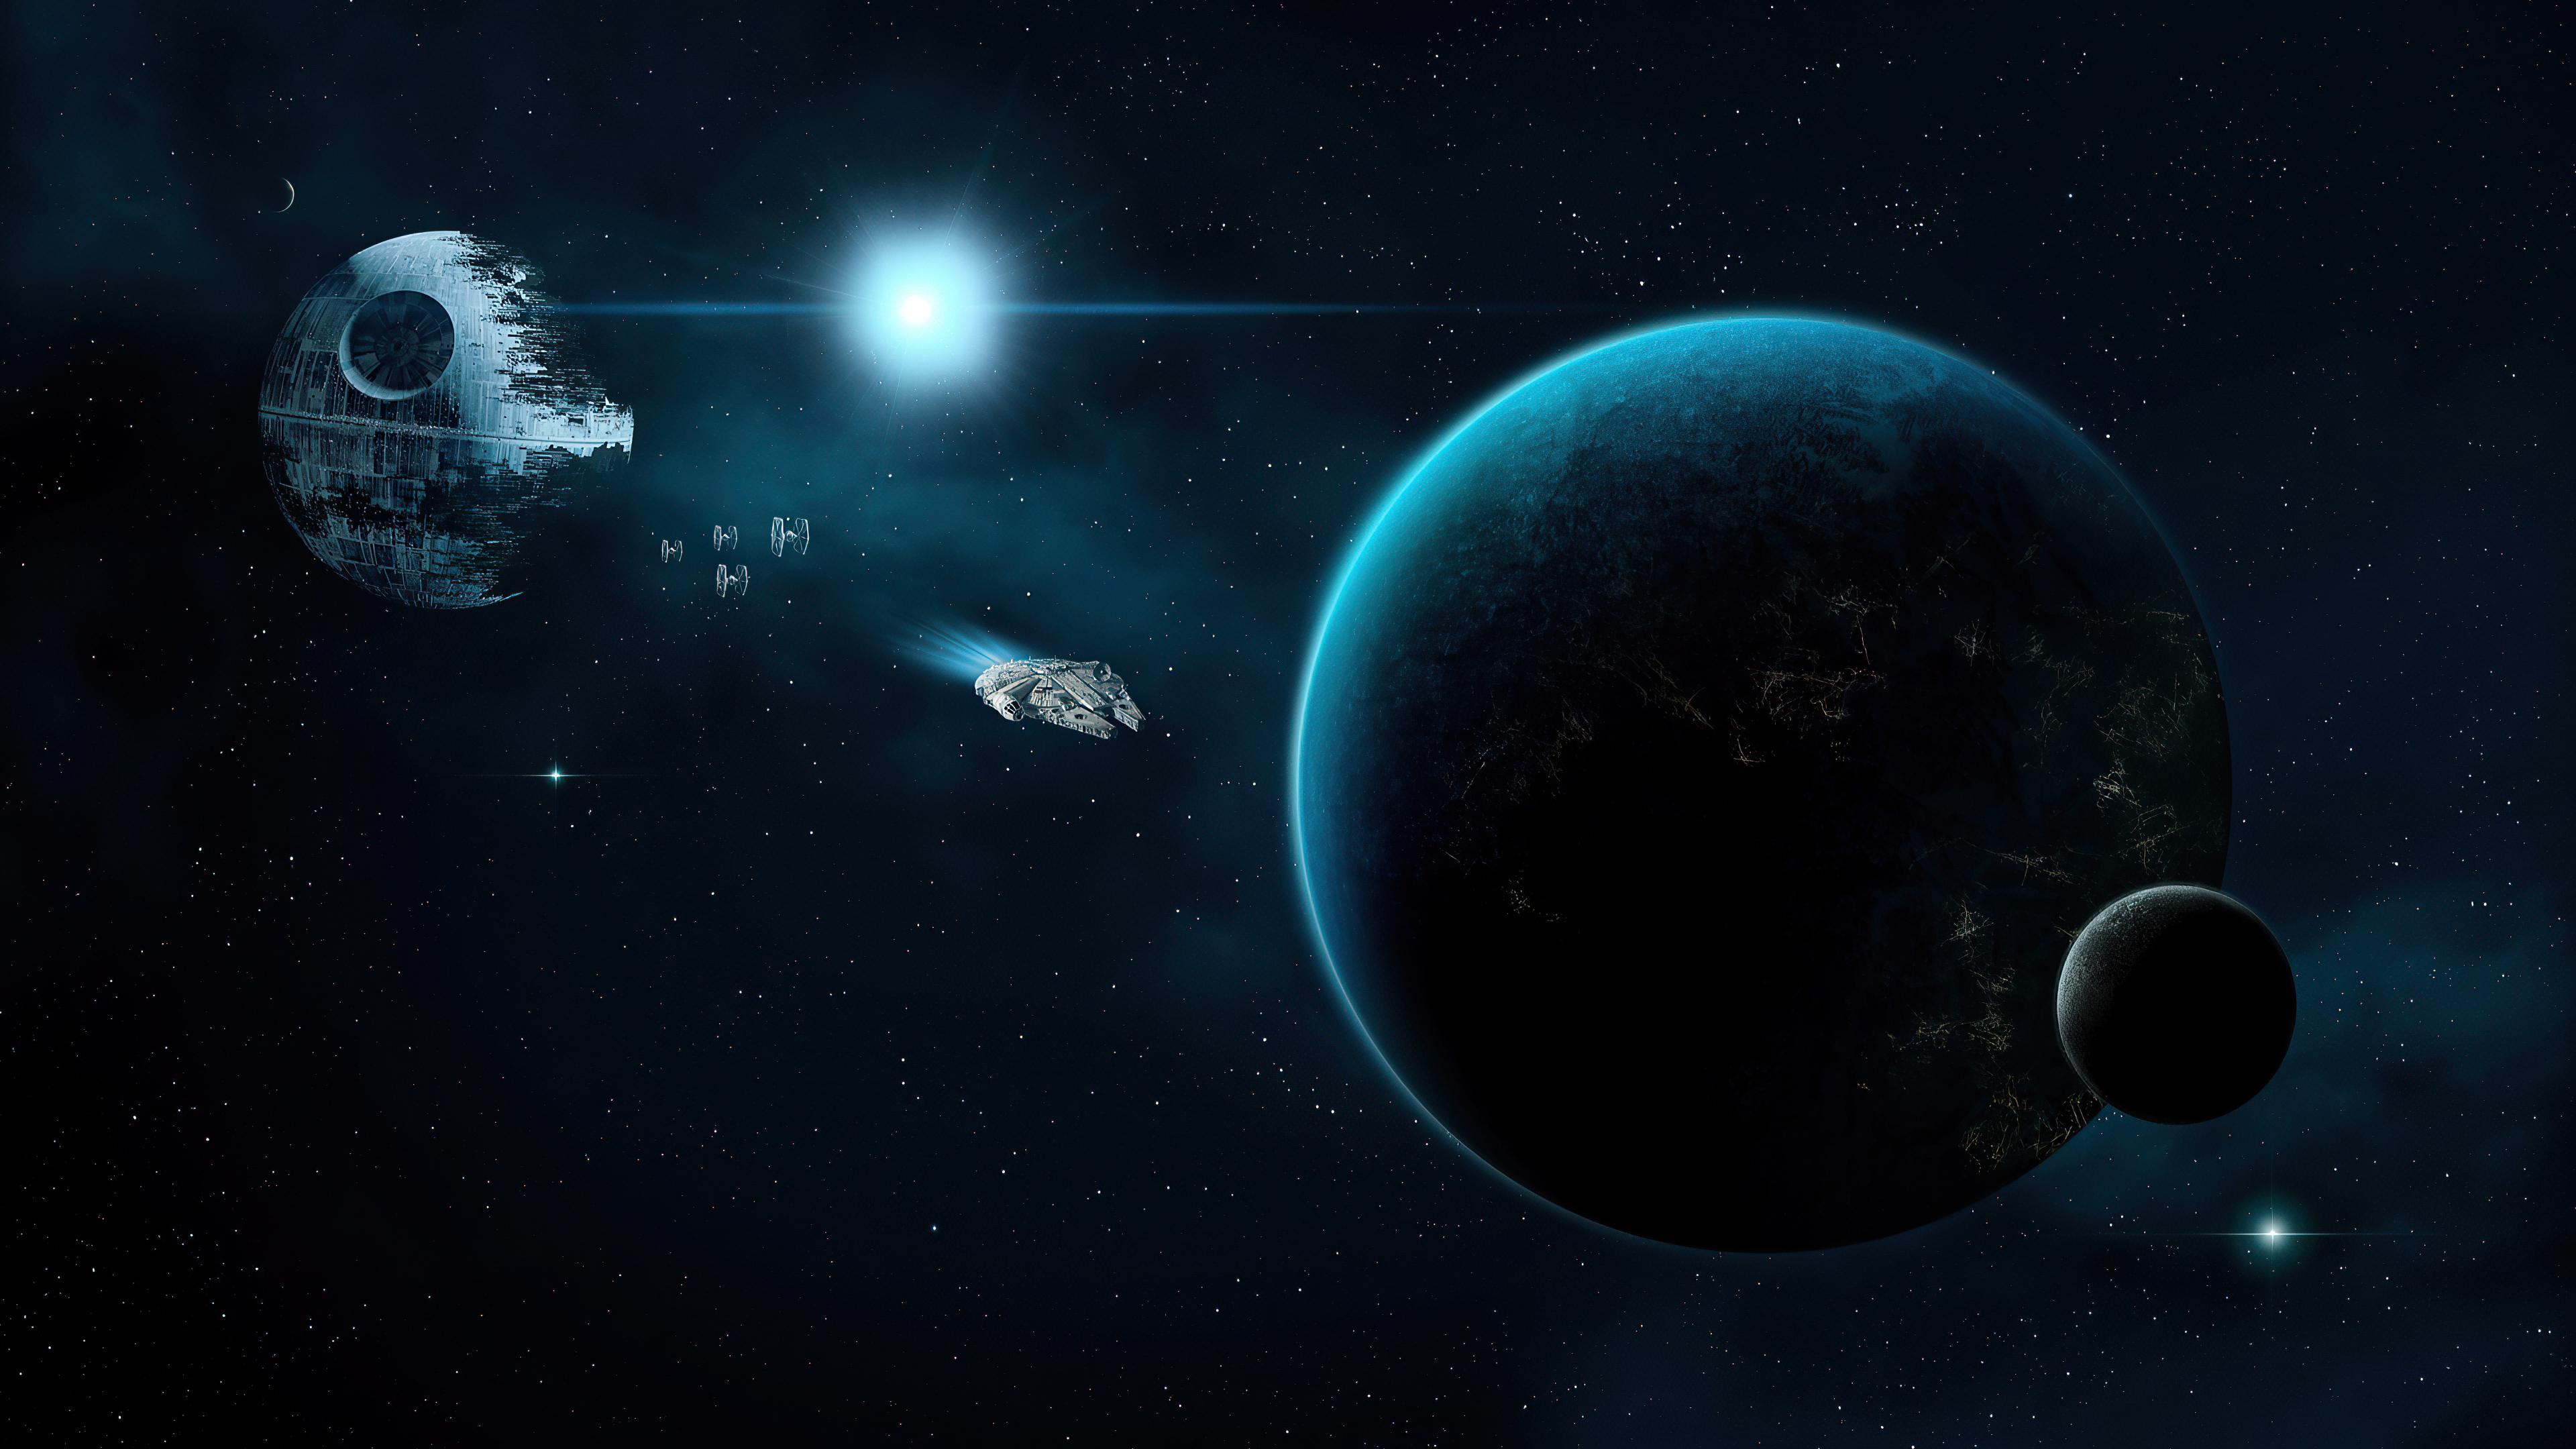 death star planet star wars nt